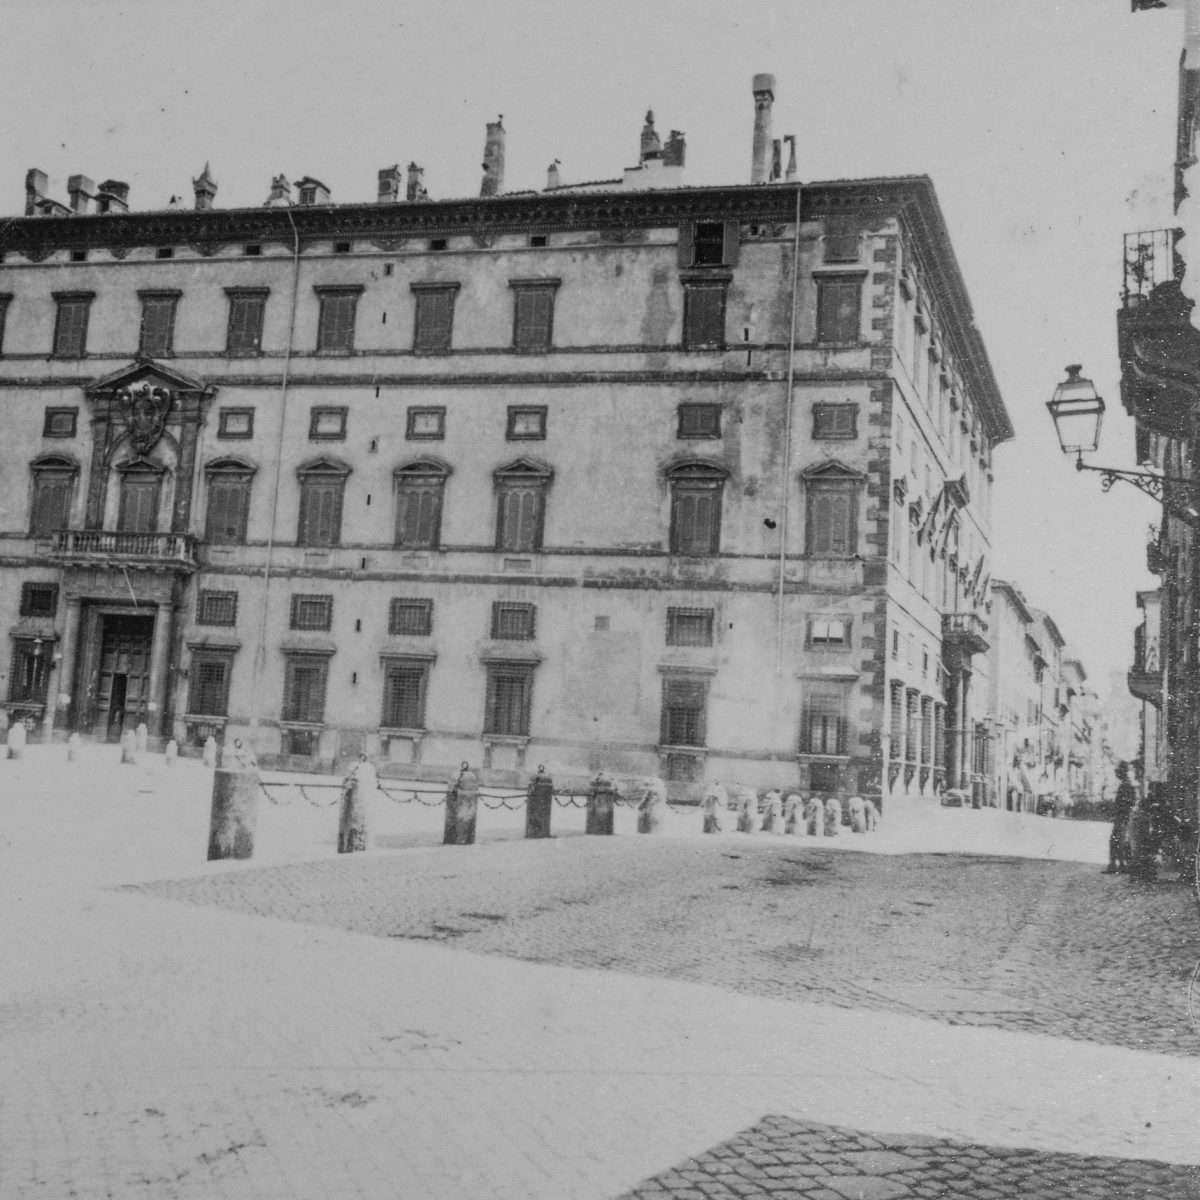 L-1090251 - Piazza Borghese